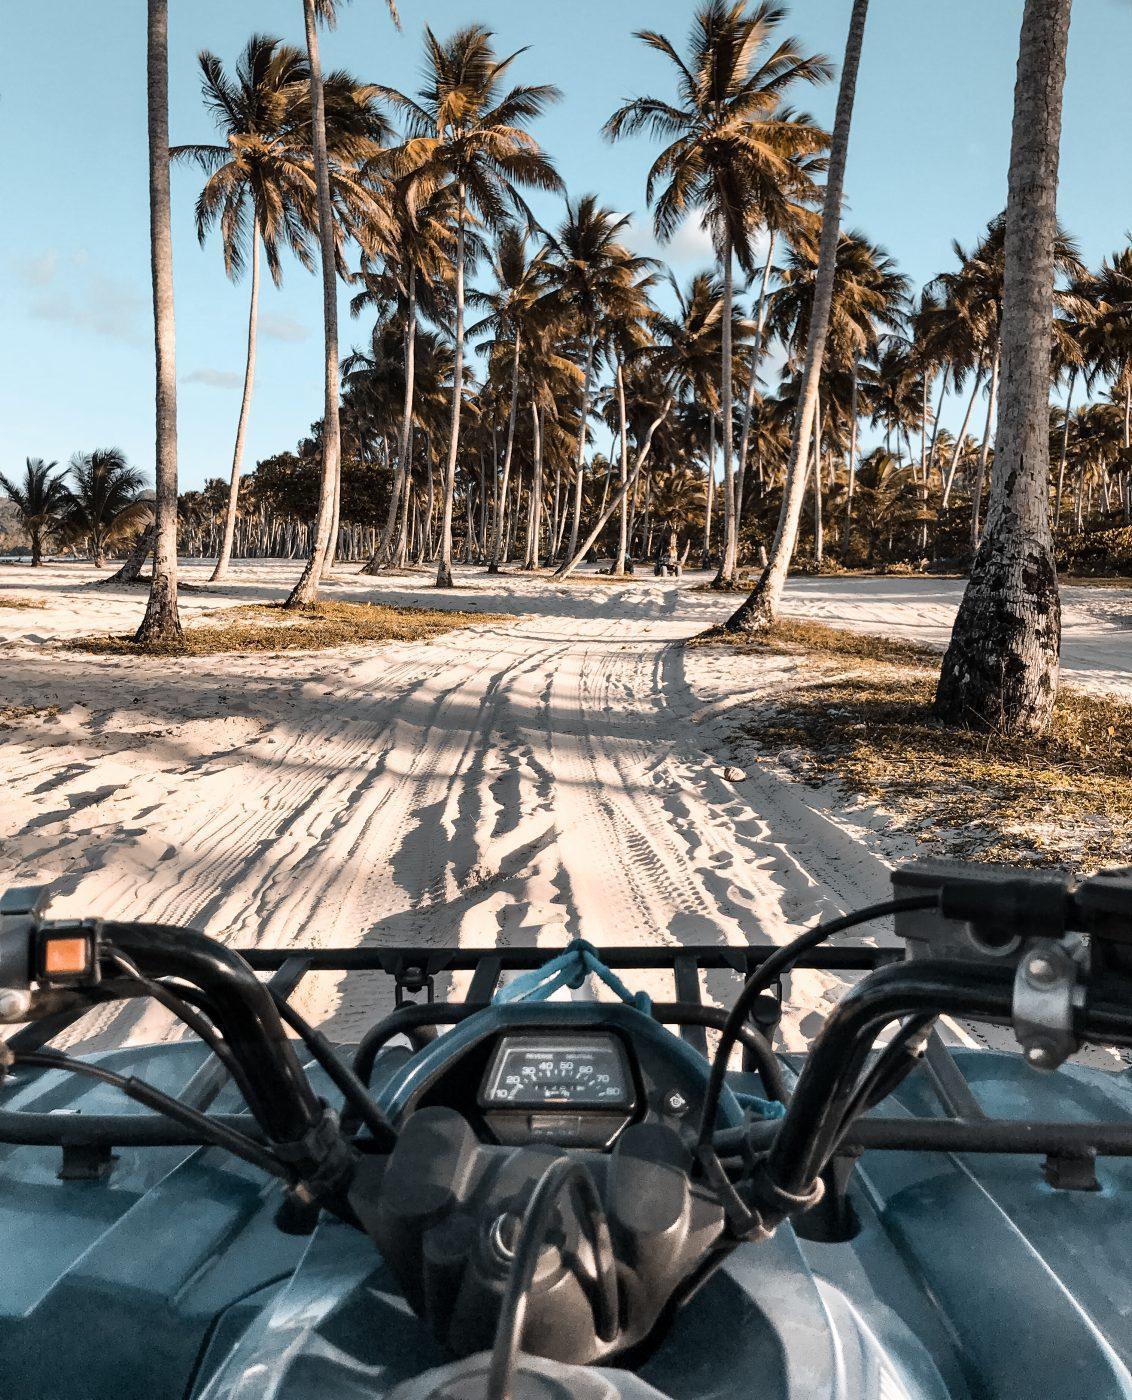 Riding an ATV in Las Galeras, the Dominican Republic